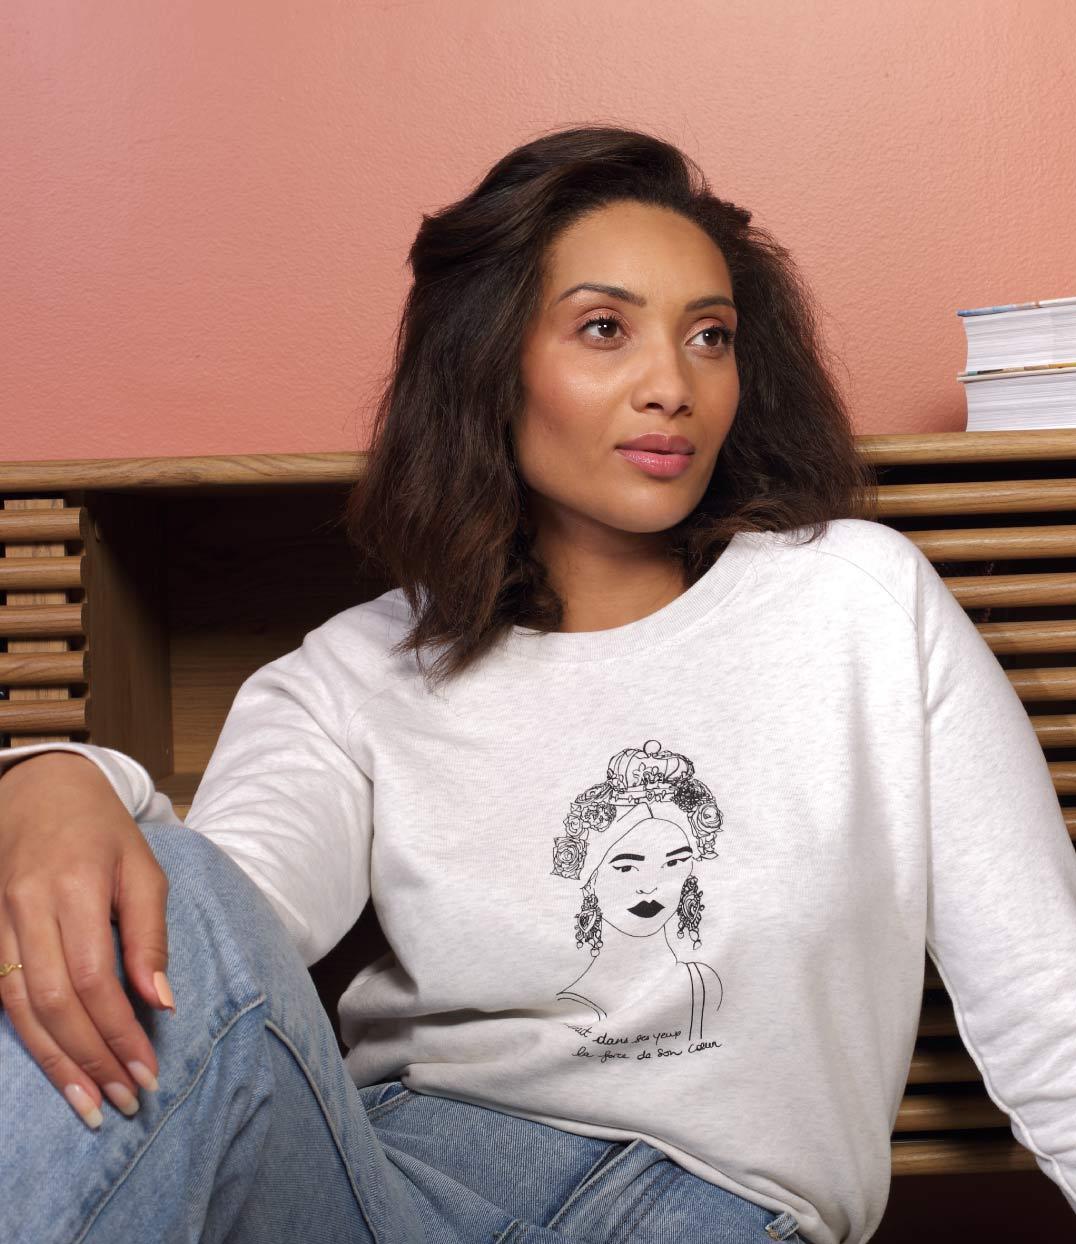 femme assise avec le sweat creme esperanza leonor roversi